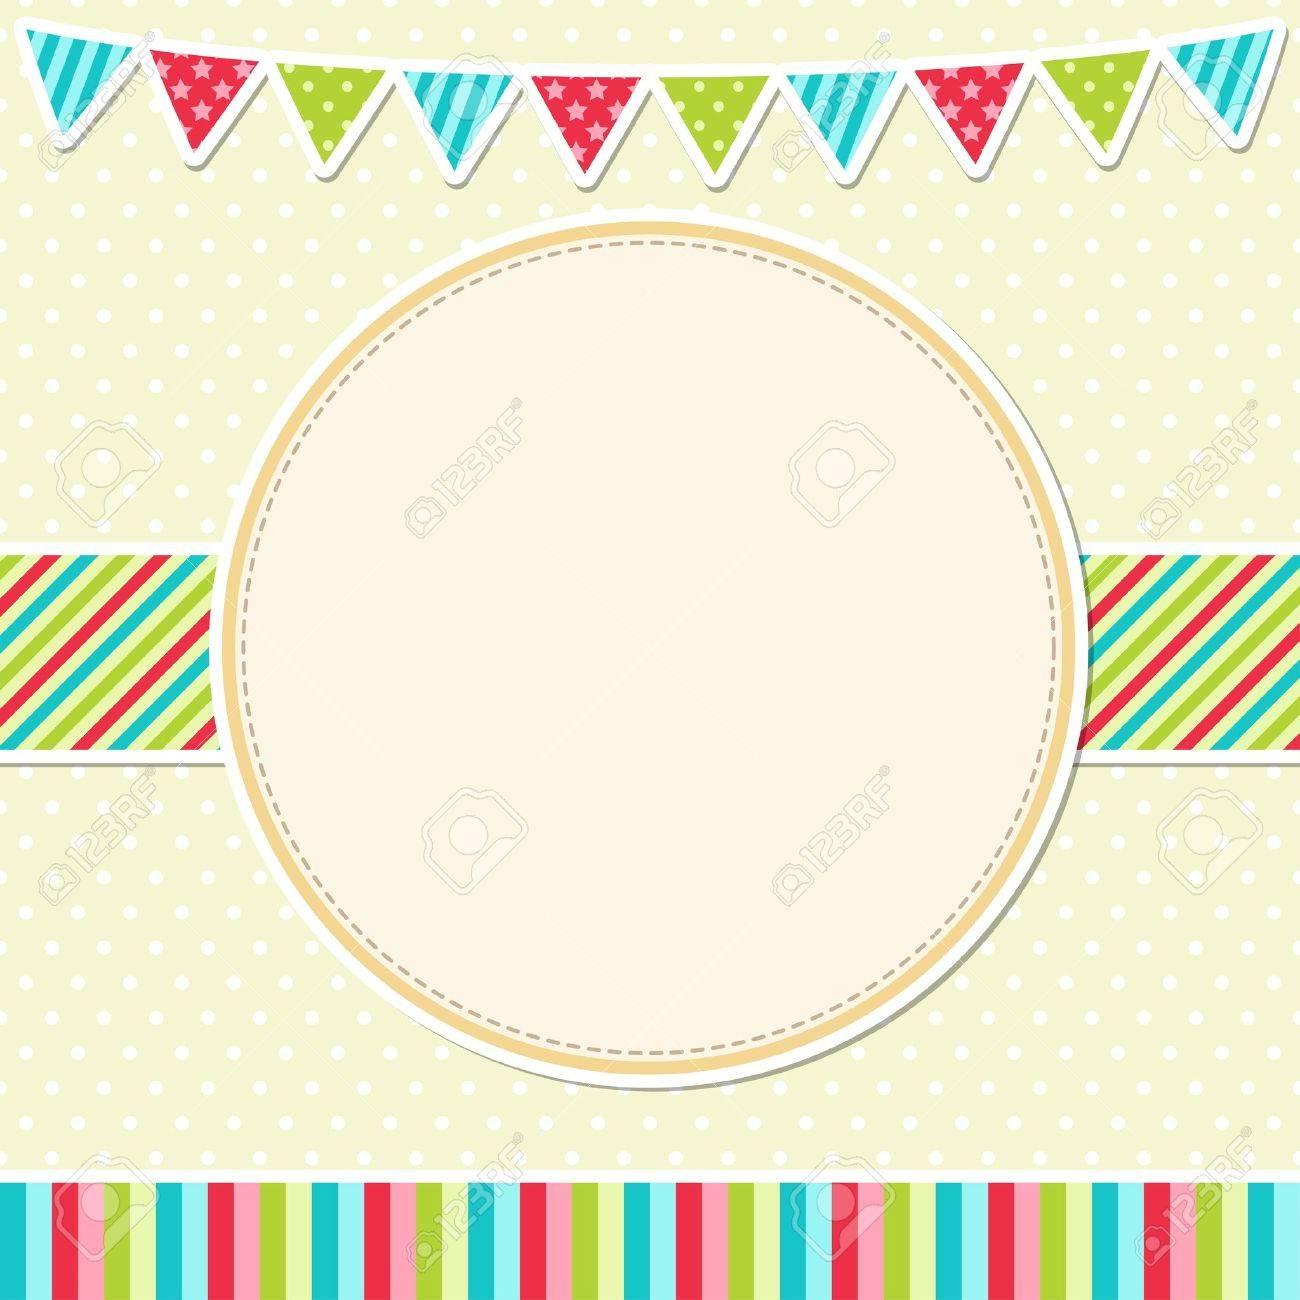 Birthday card with garland - 14714603